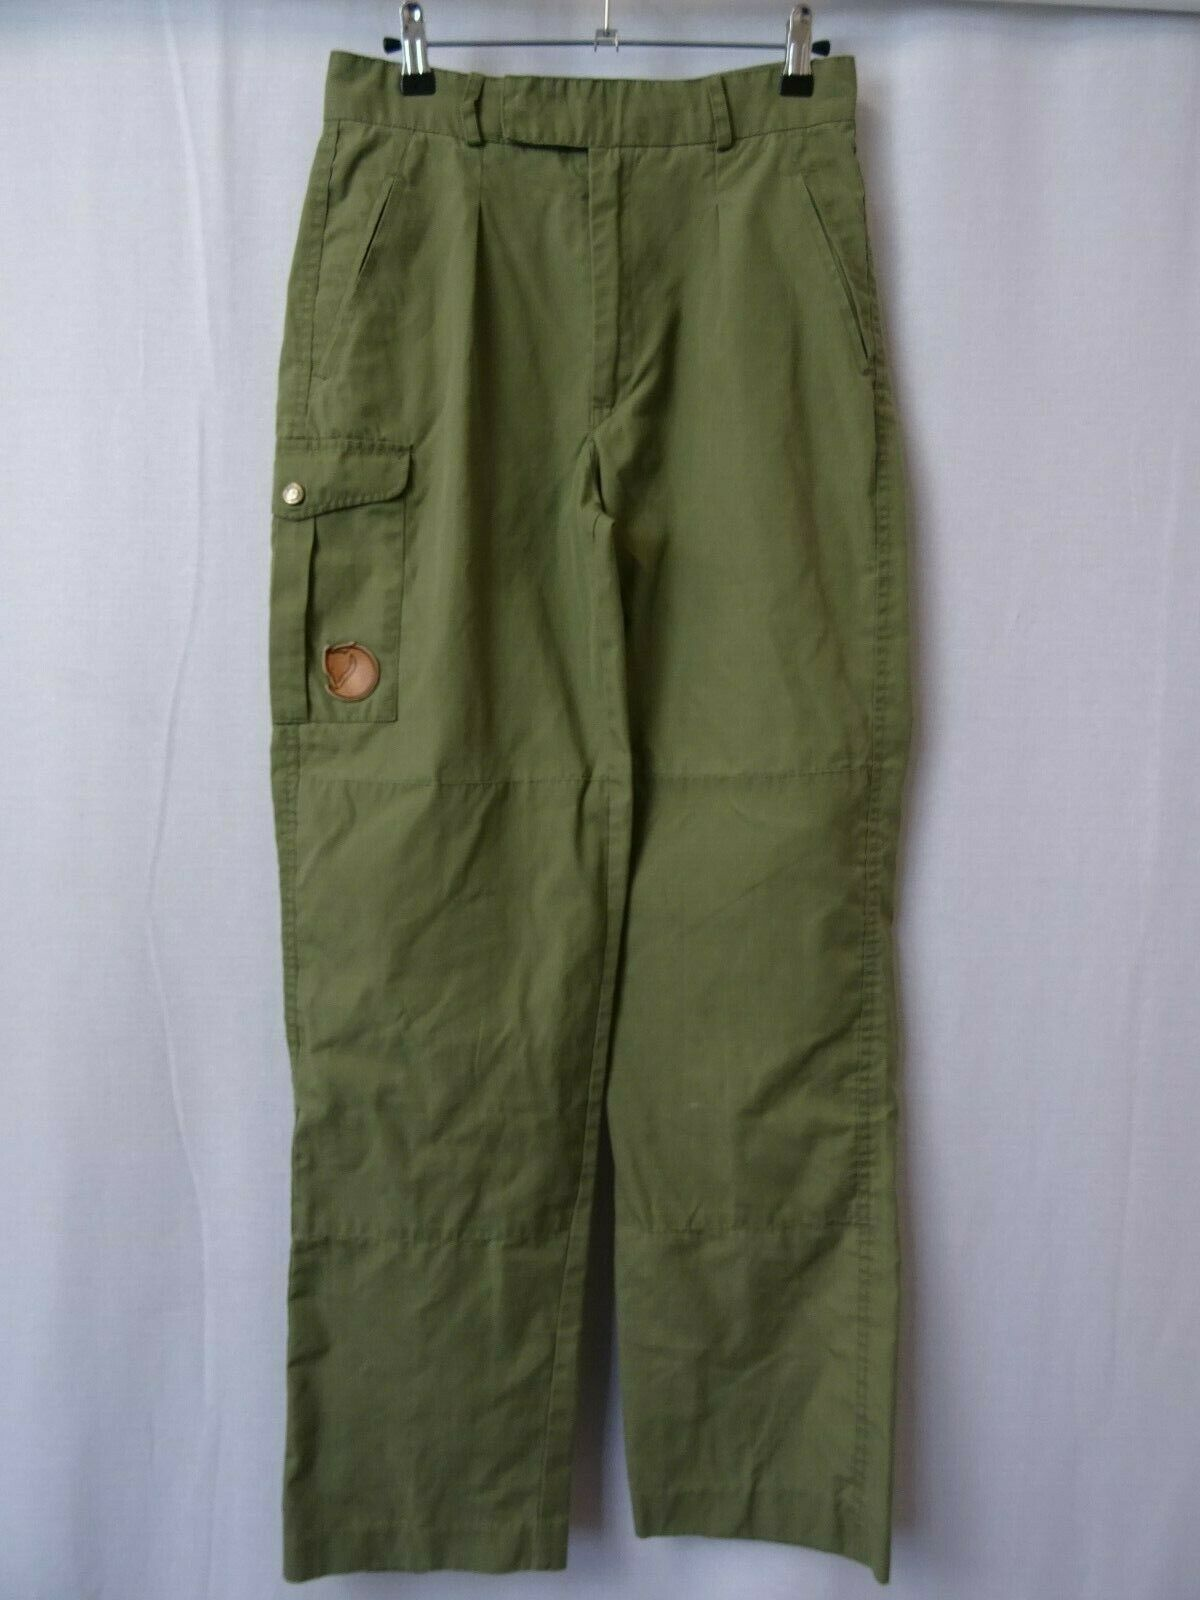 Men's Fjällräven Greenland Trousers Outdoor Pants W28 L31